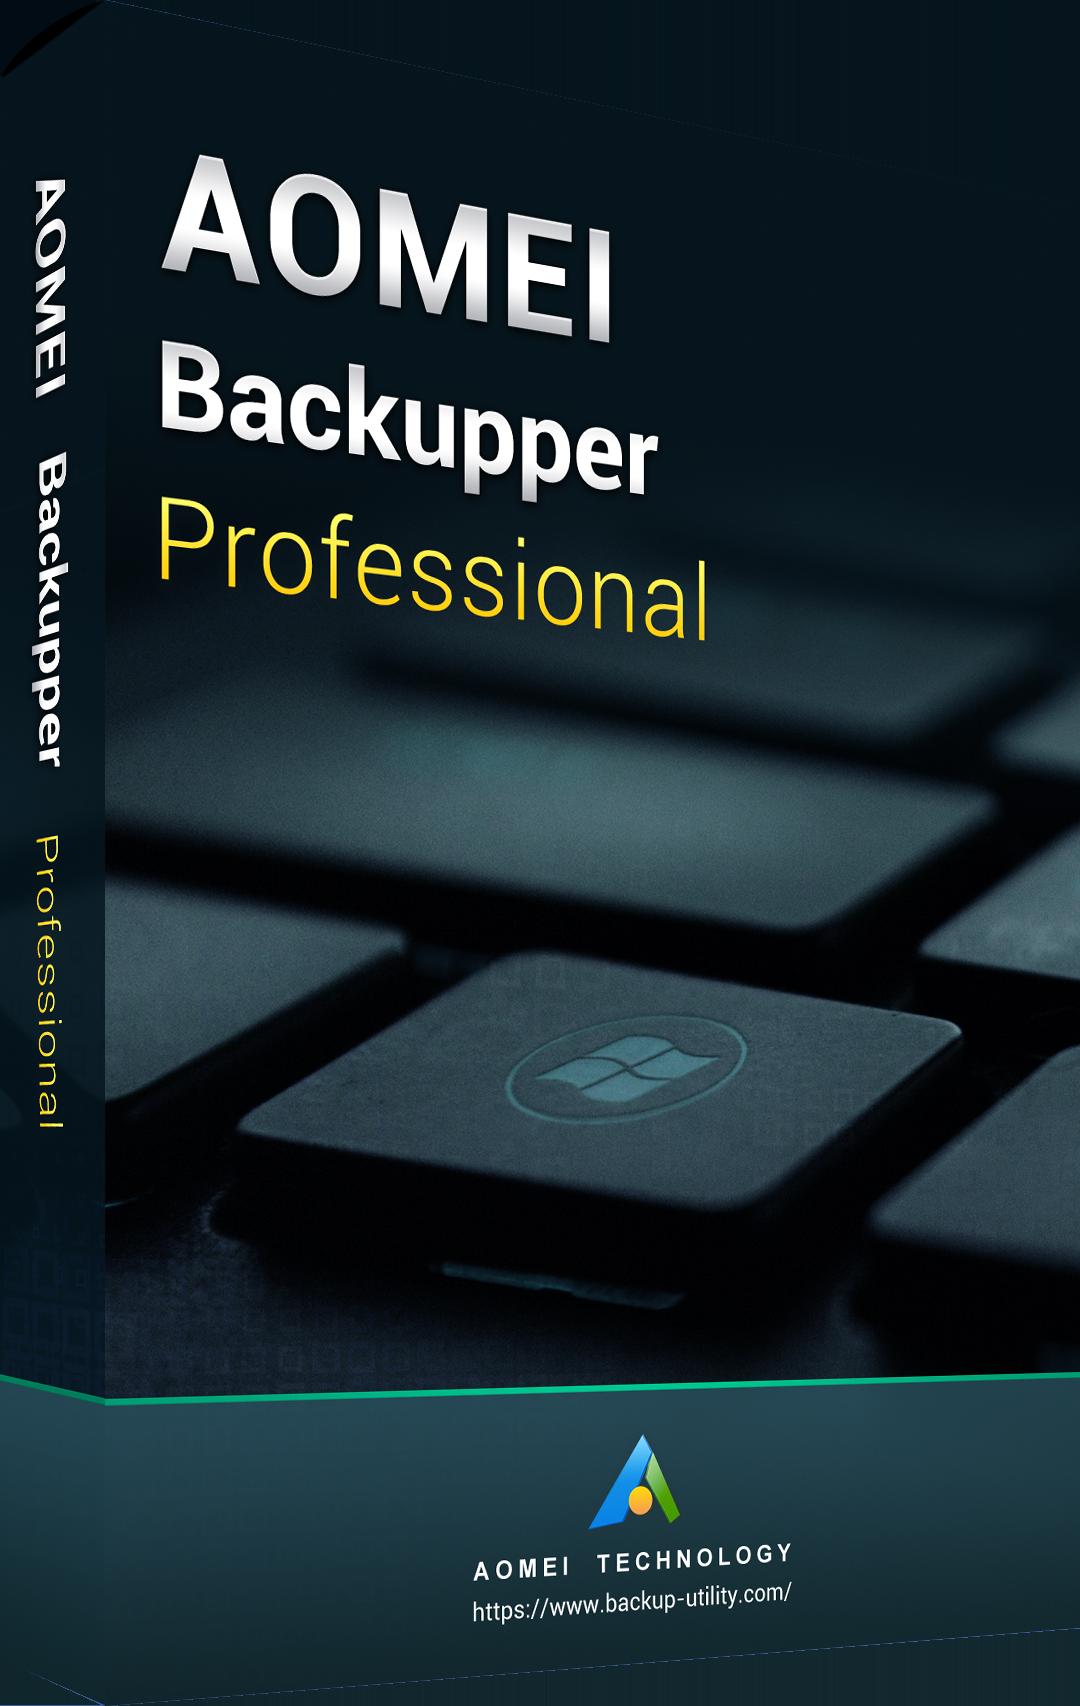 AOMEI Backupper Professional 5.0 Key Global